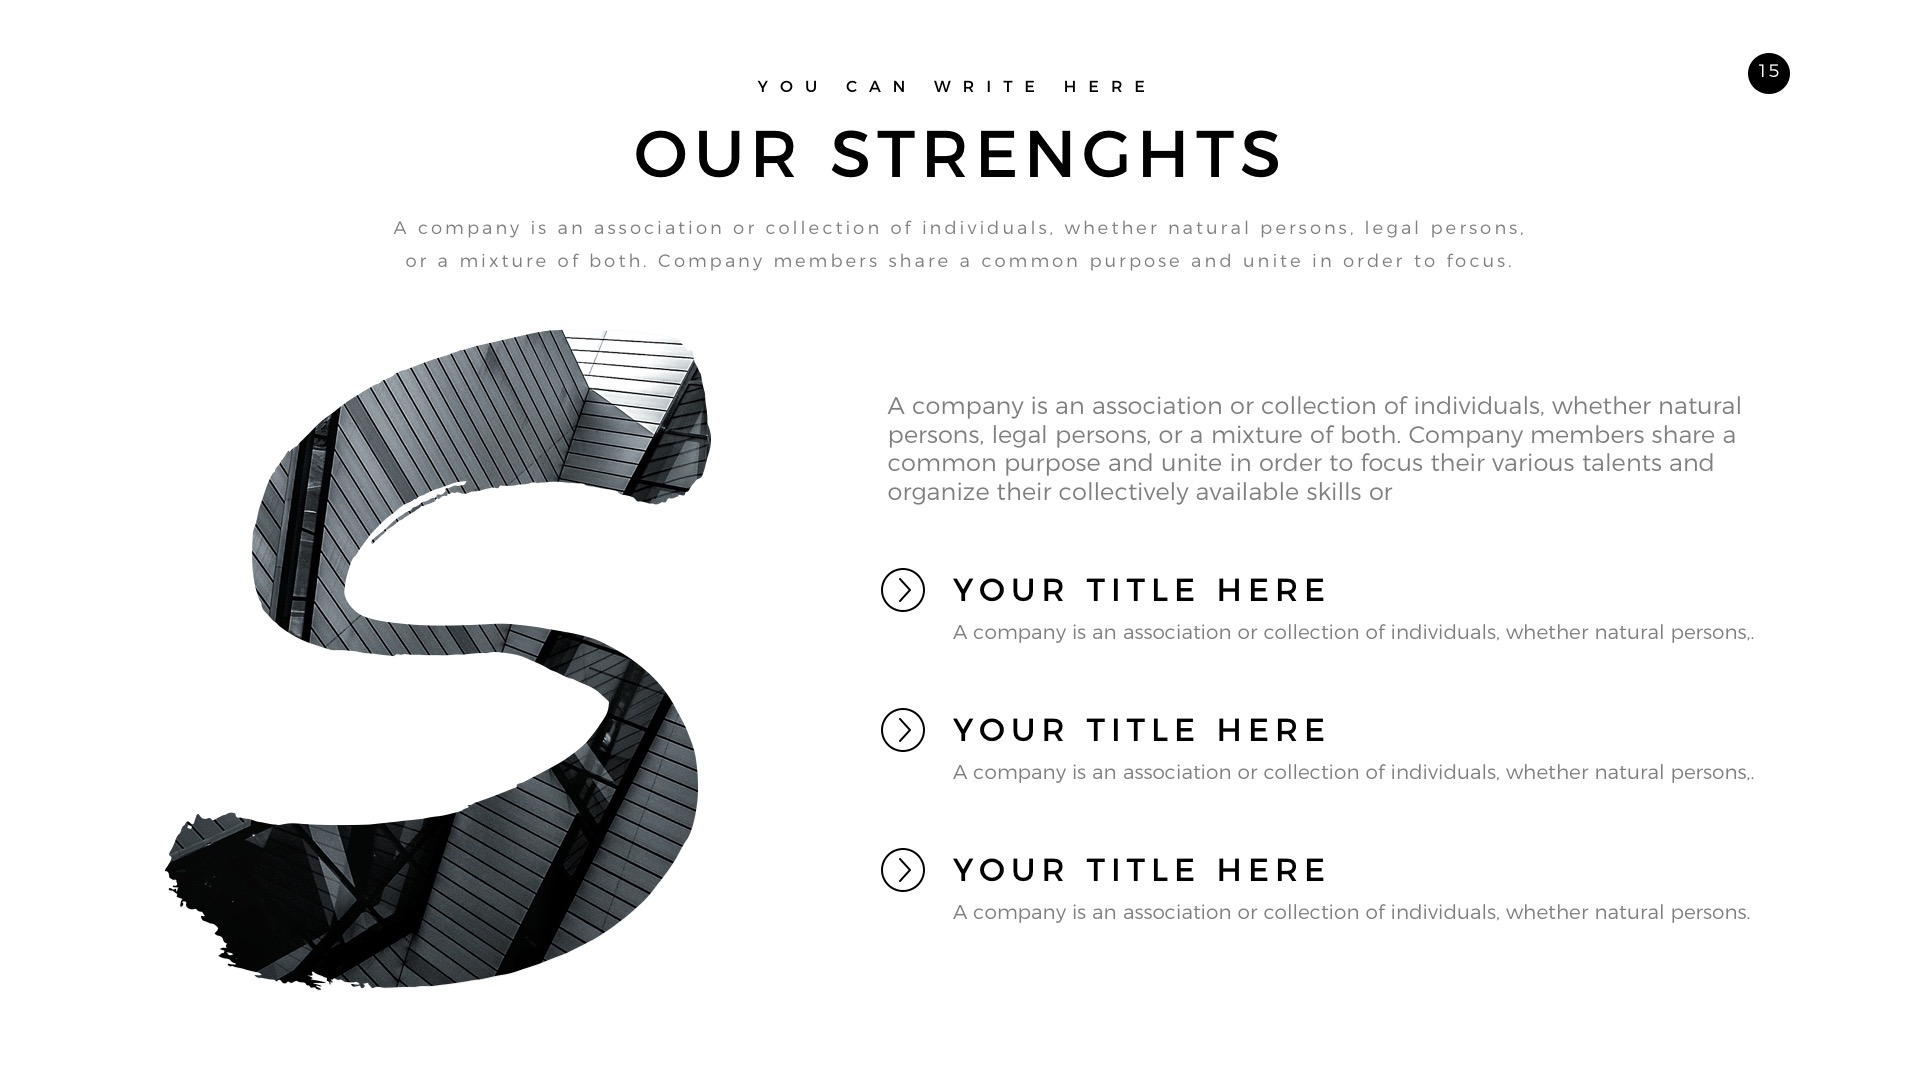 Starlight Minimal Powerpoint Template Pitch Deck By Louistwelve Design